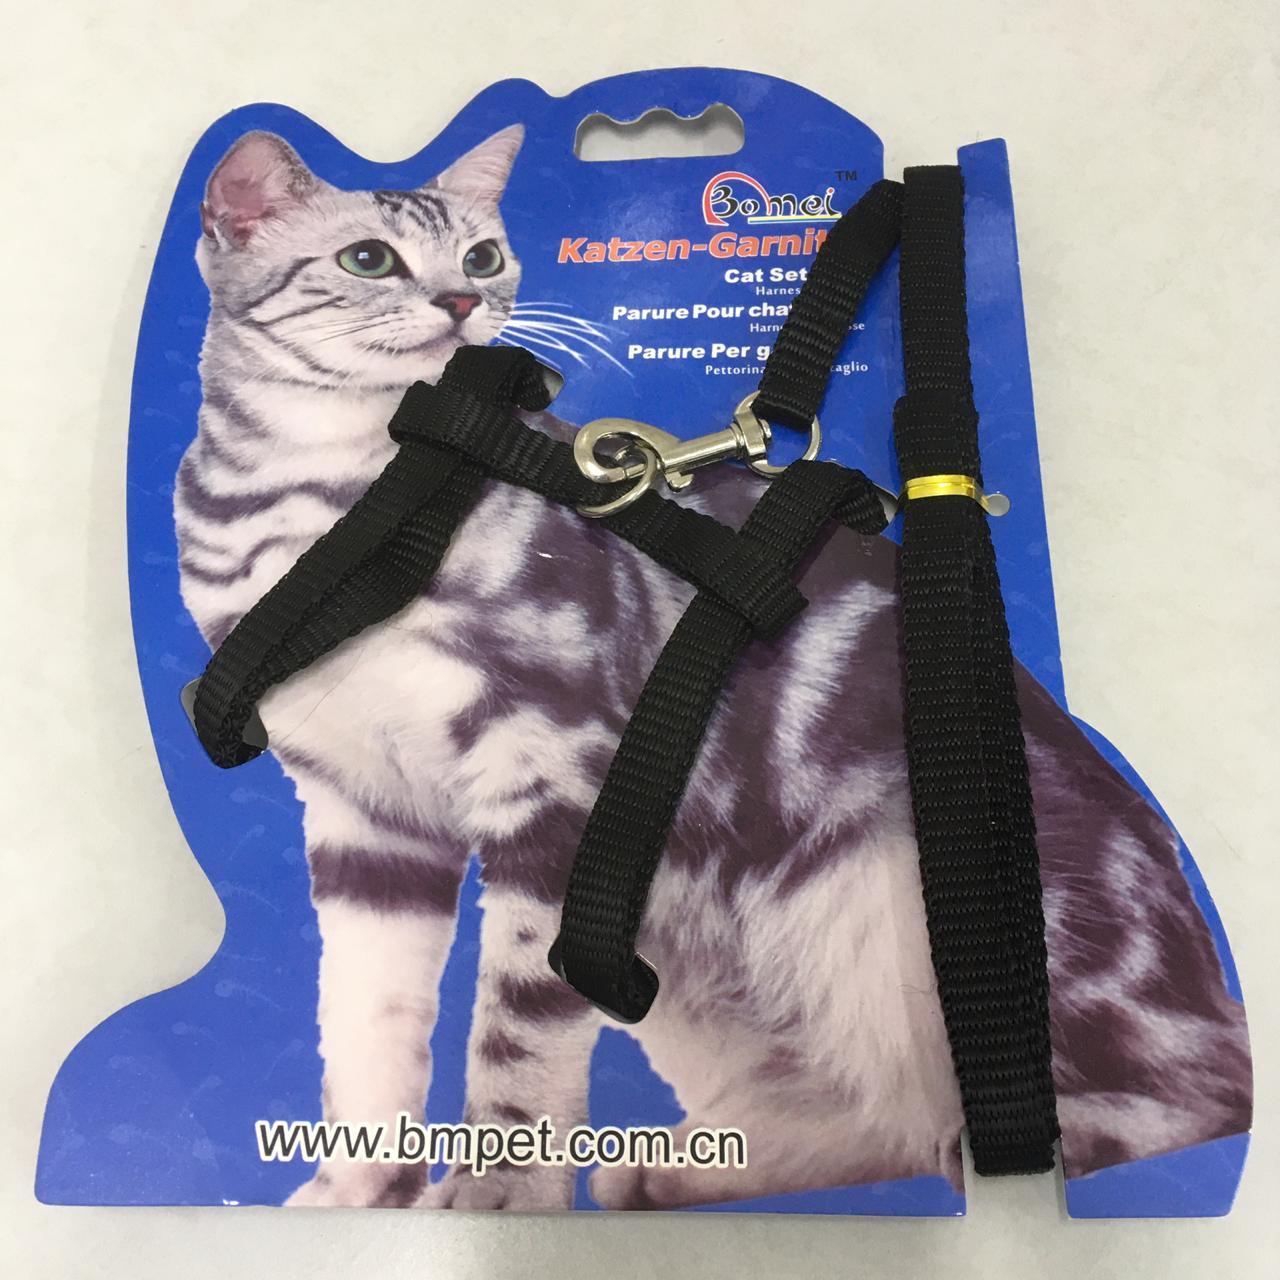 Guia e peitoral para gatos Bomei